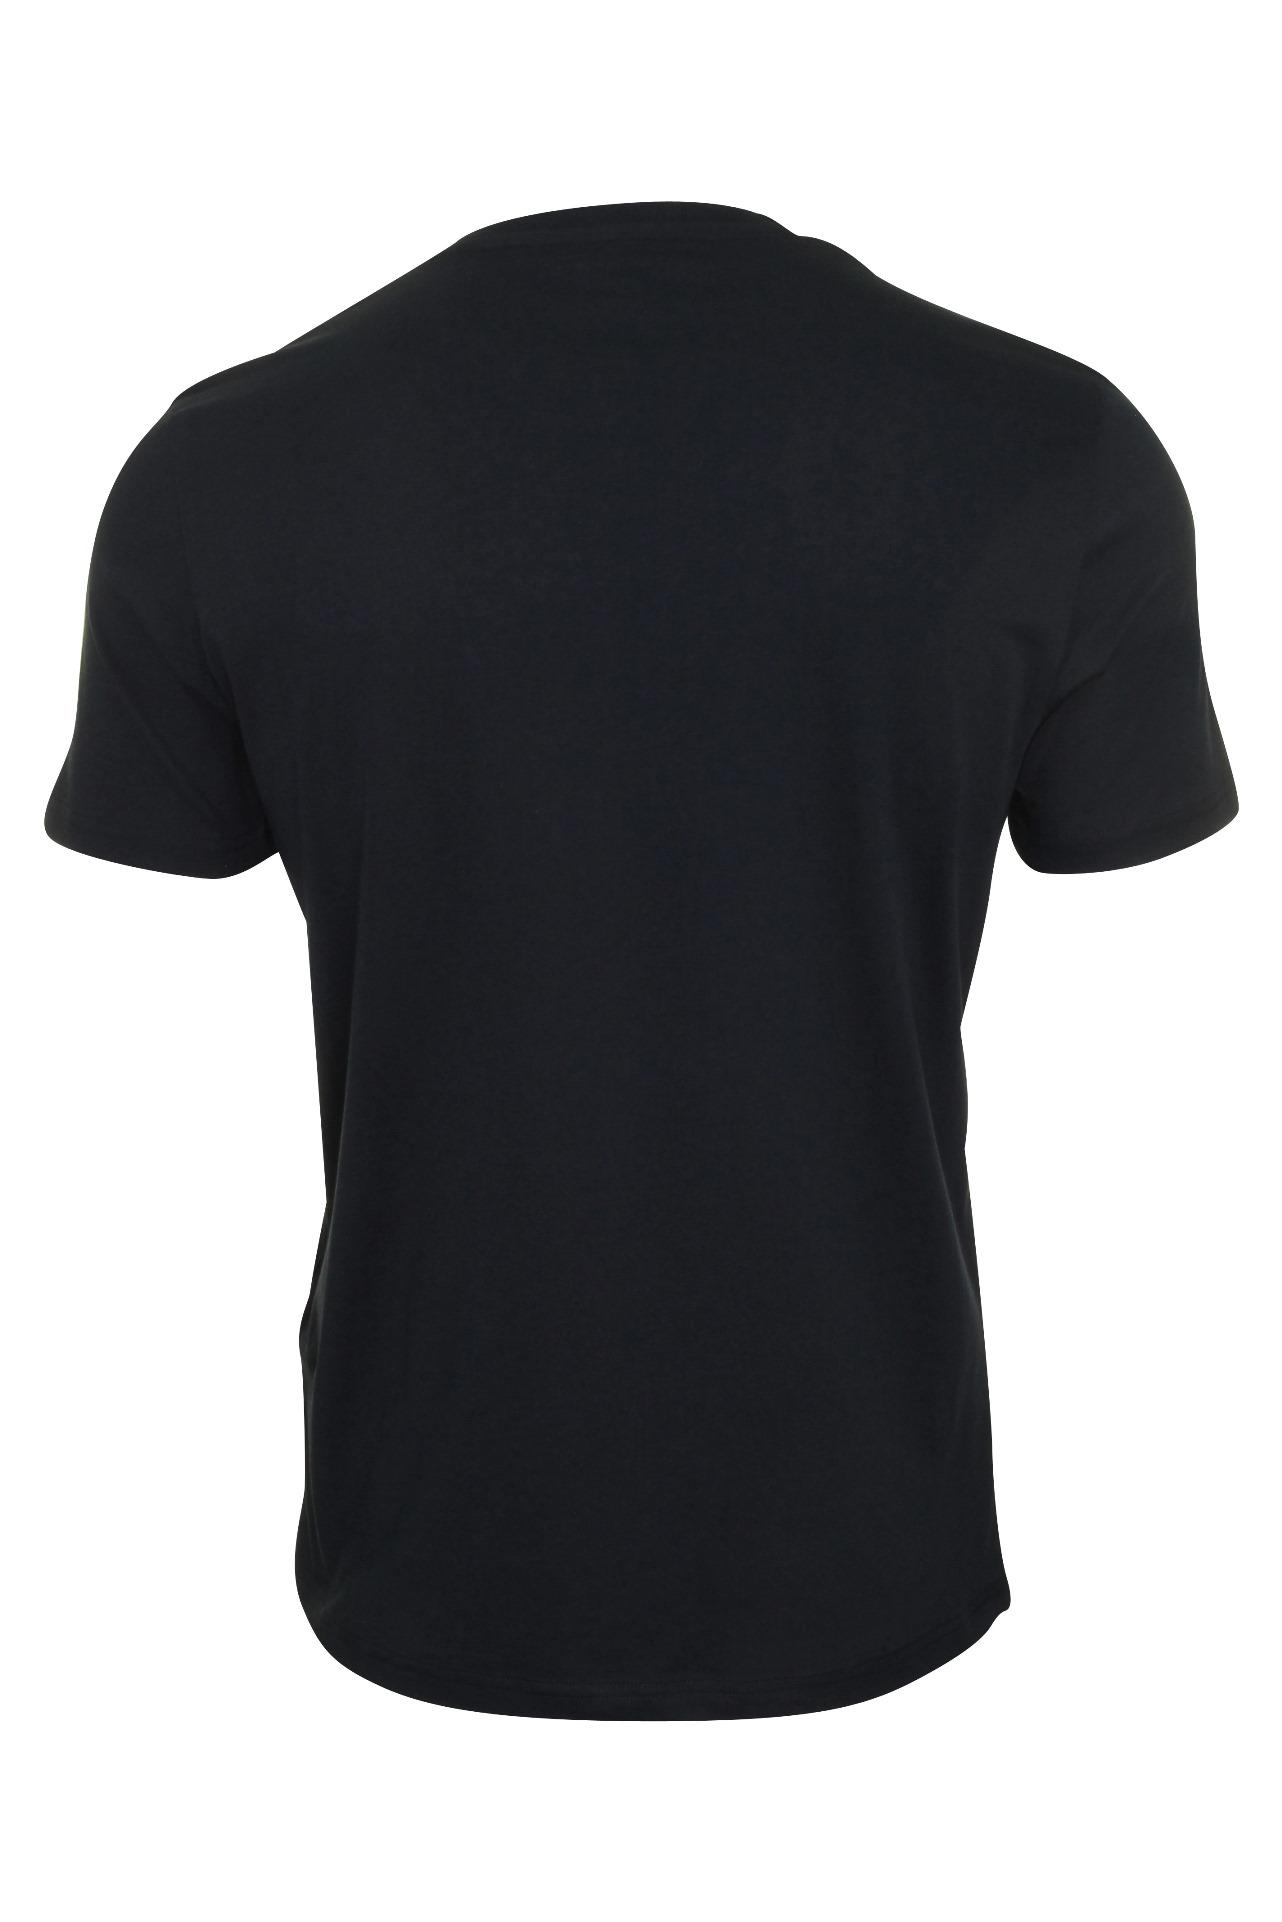 Mens-Classic-Spade-Pocket-T-Shirt-by-Ben-Sherman thumbnail 7